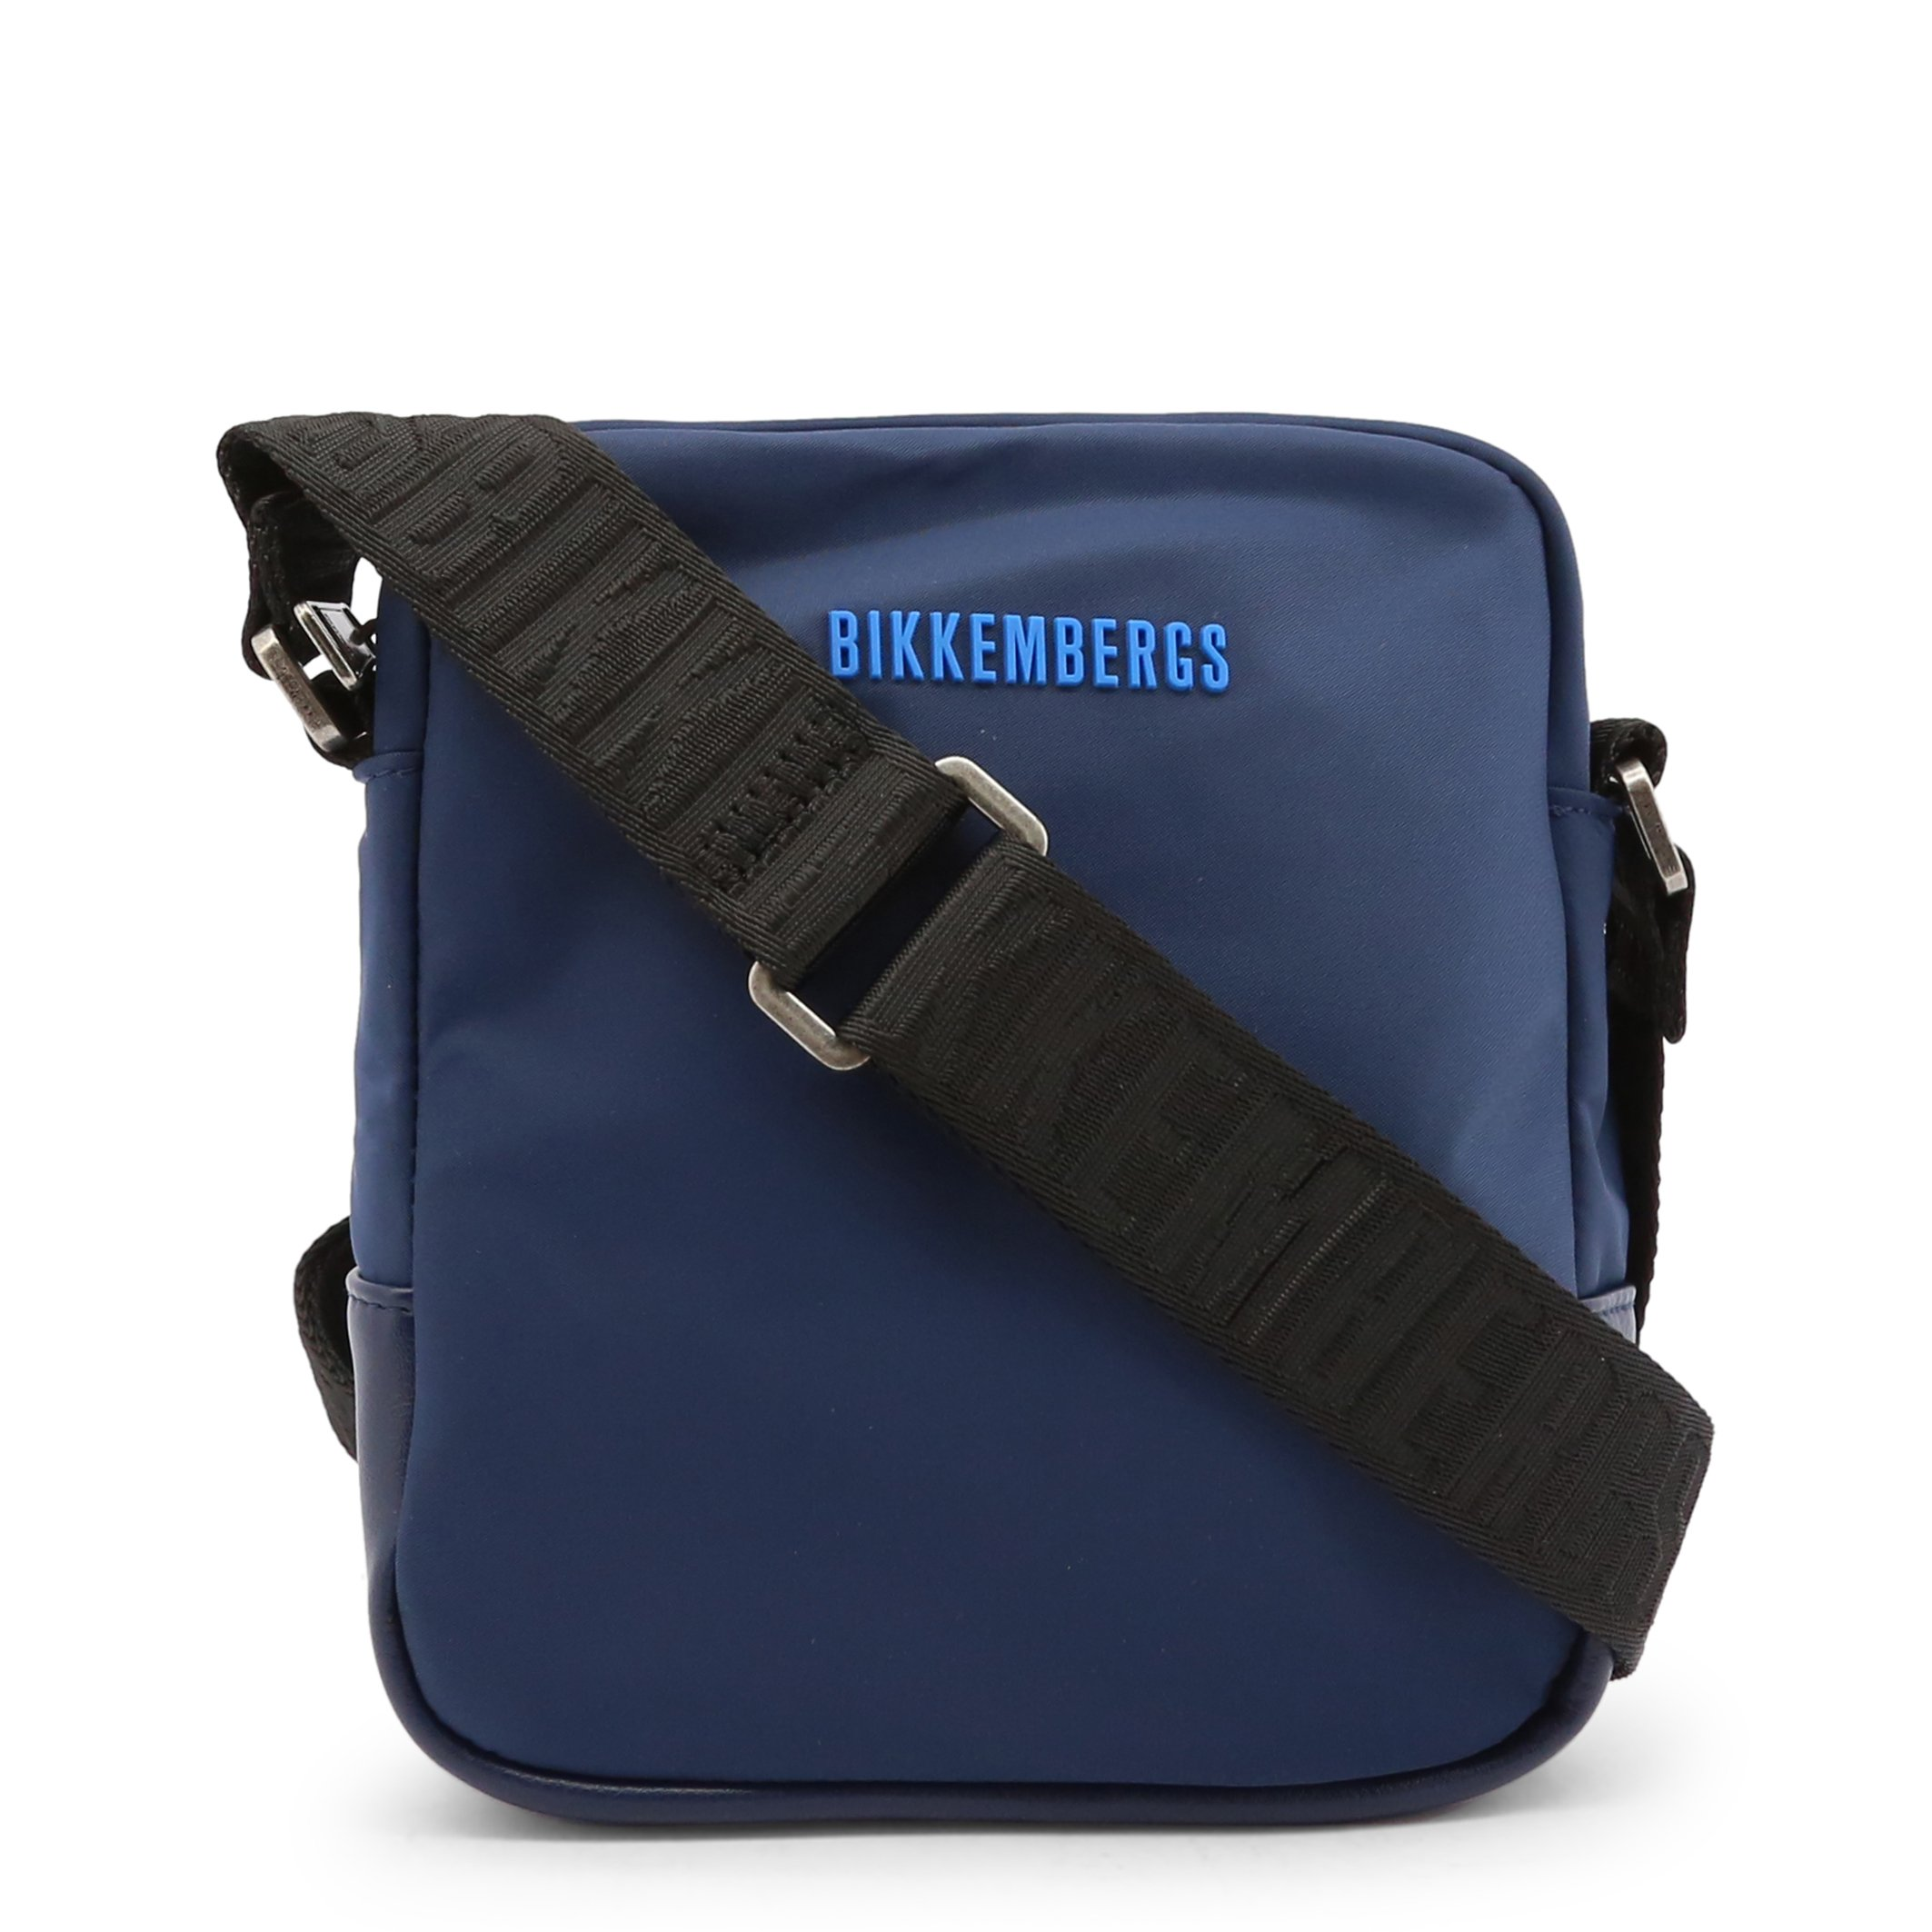 Bikkembergs Men's Crossbody Bag Various Colours E2BPME1Q0022 - blue NOSIZE